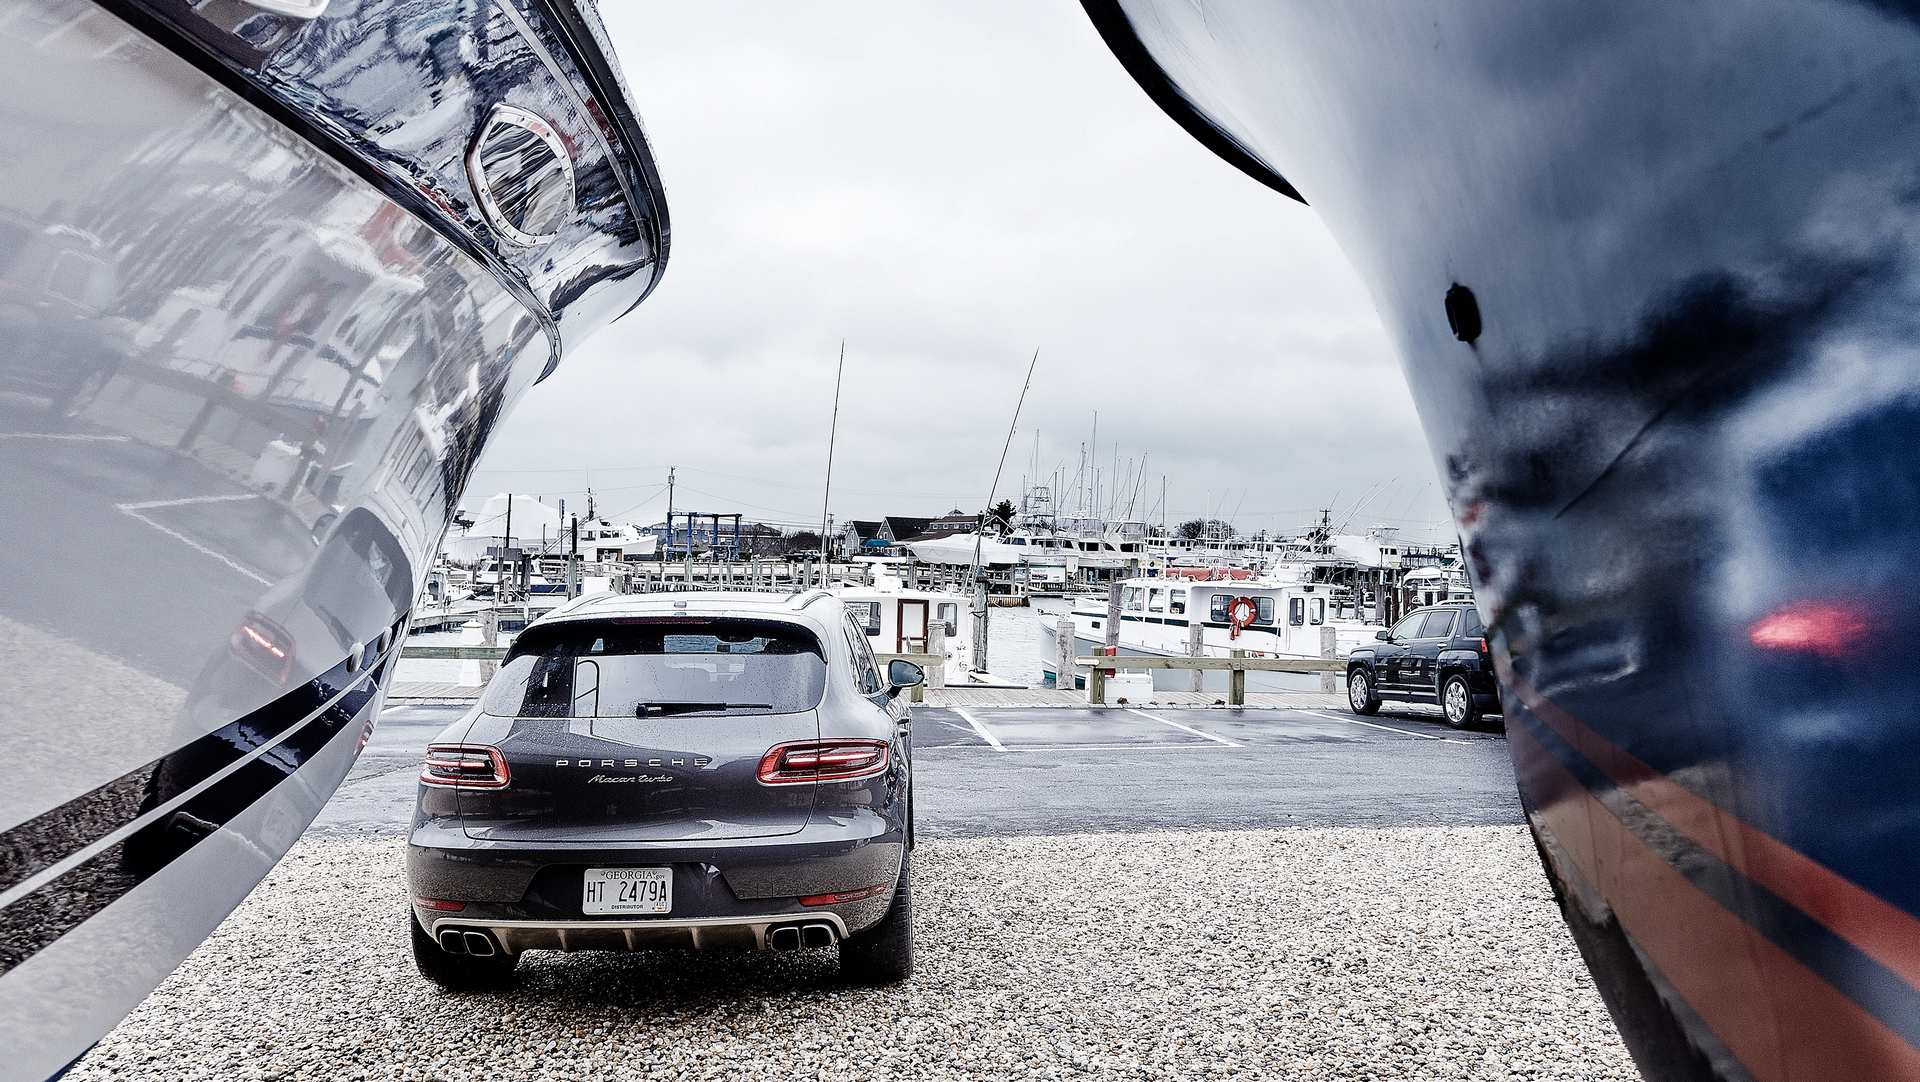 2016 Porsche Macan Turbo © Dr. Ing. h.c. F. Porsche AG.